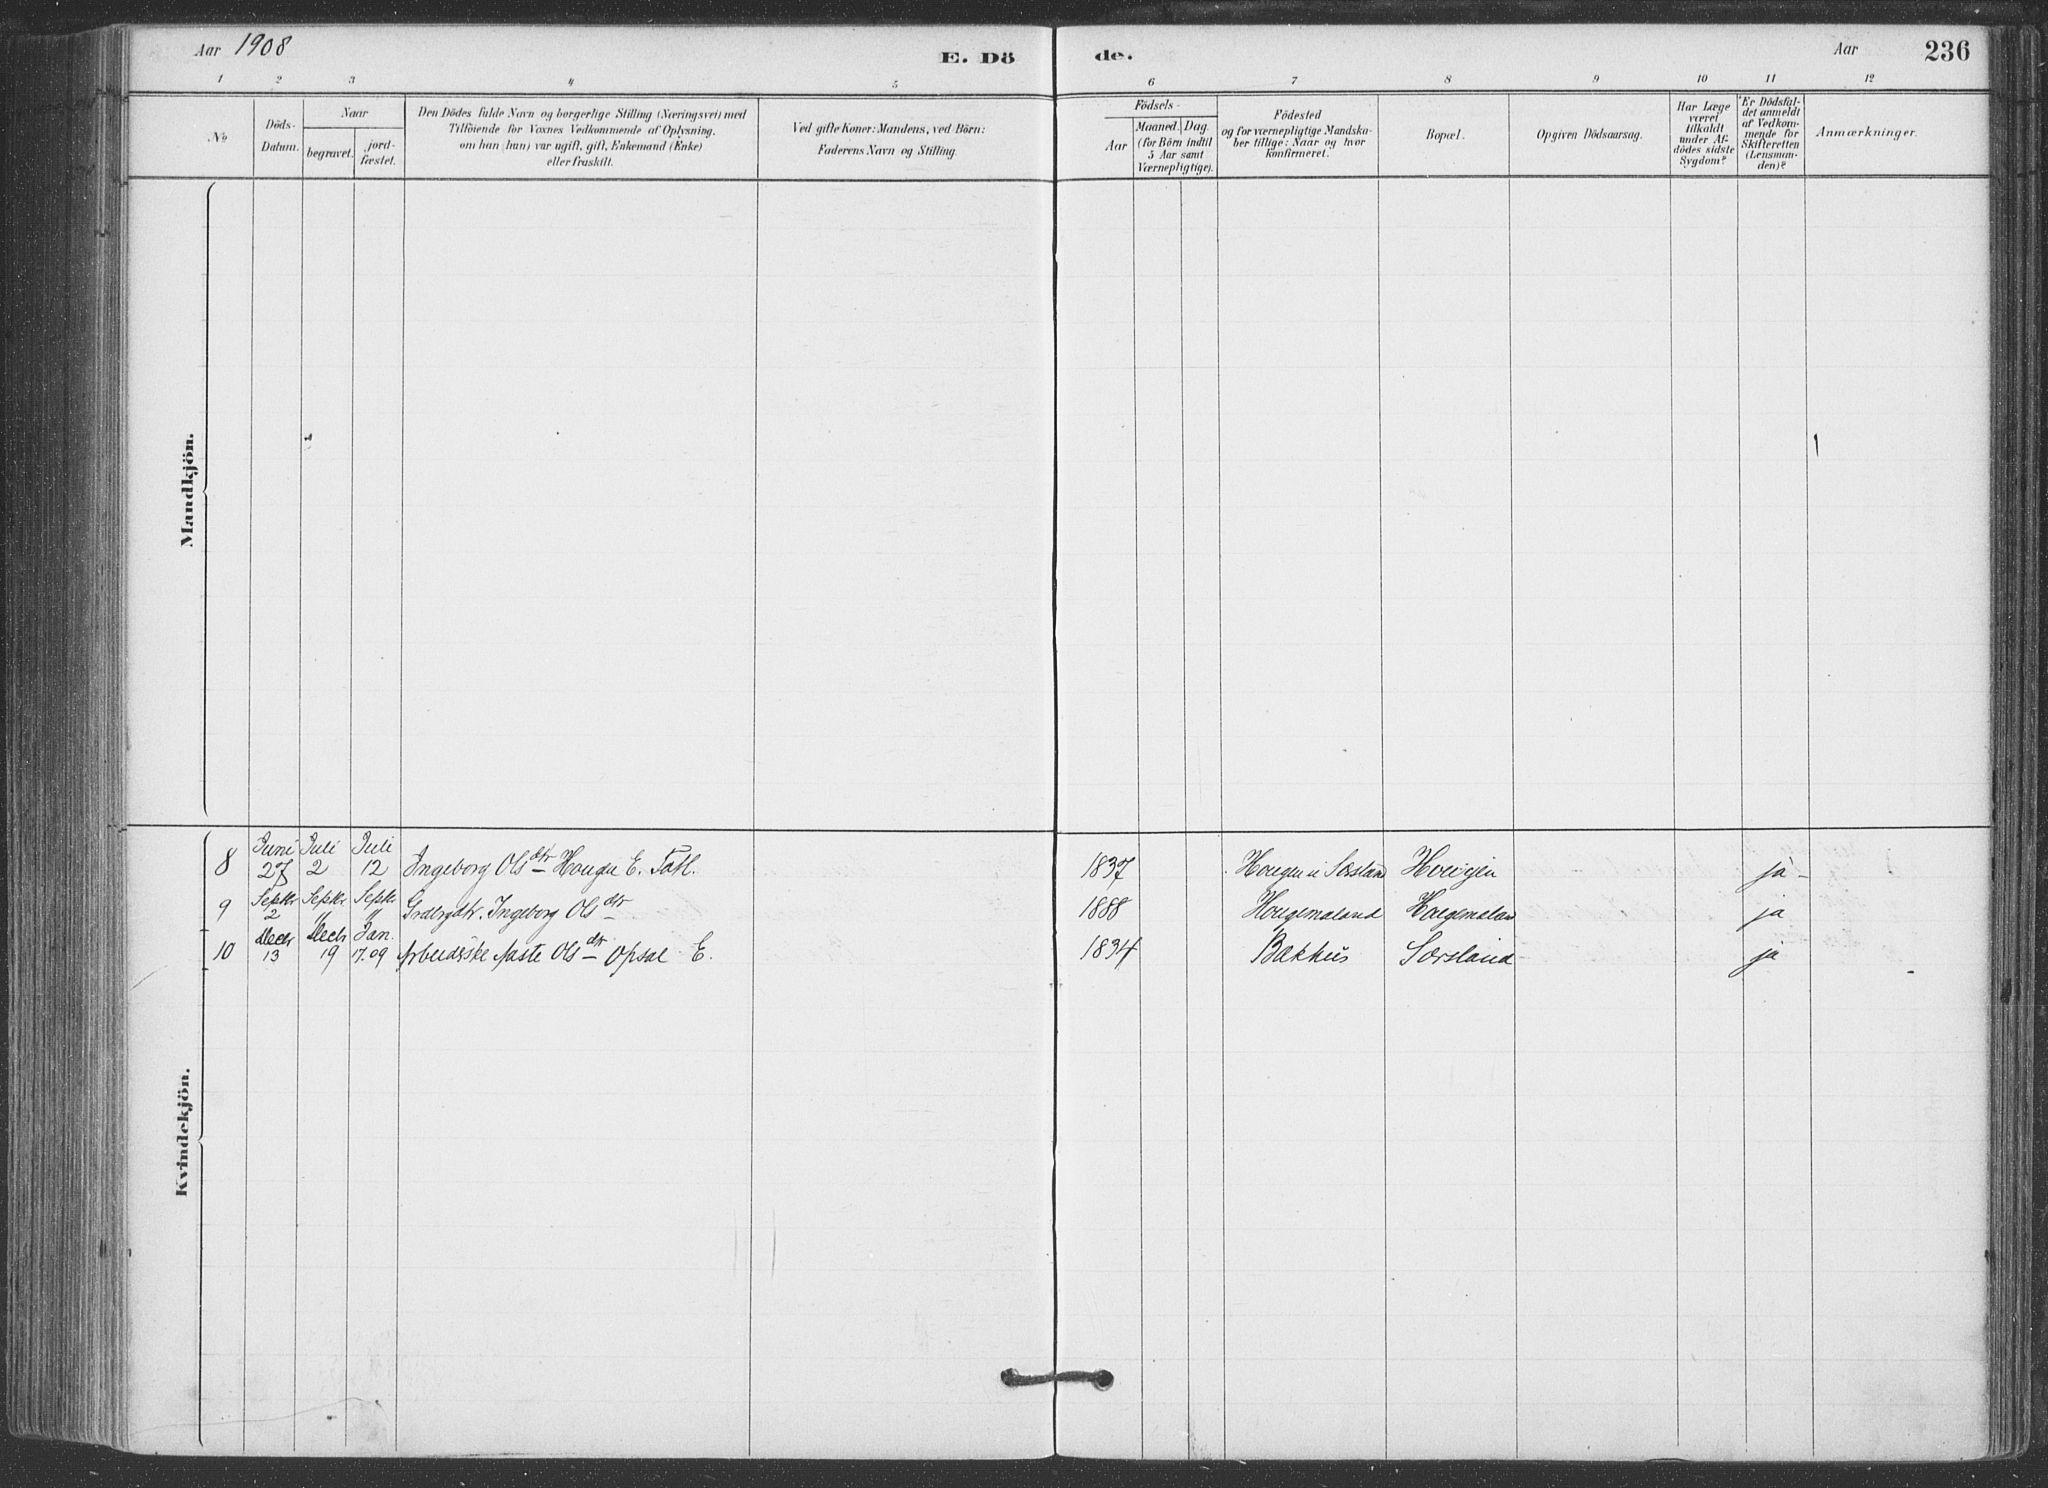 SAKO, Hjartdal kirkebøker, F/Fa/L0010: Ministerialbok nr. I 10, 1880-1929, s. 236